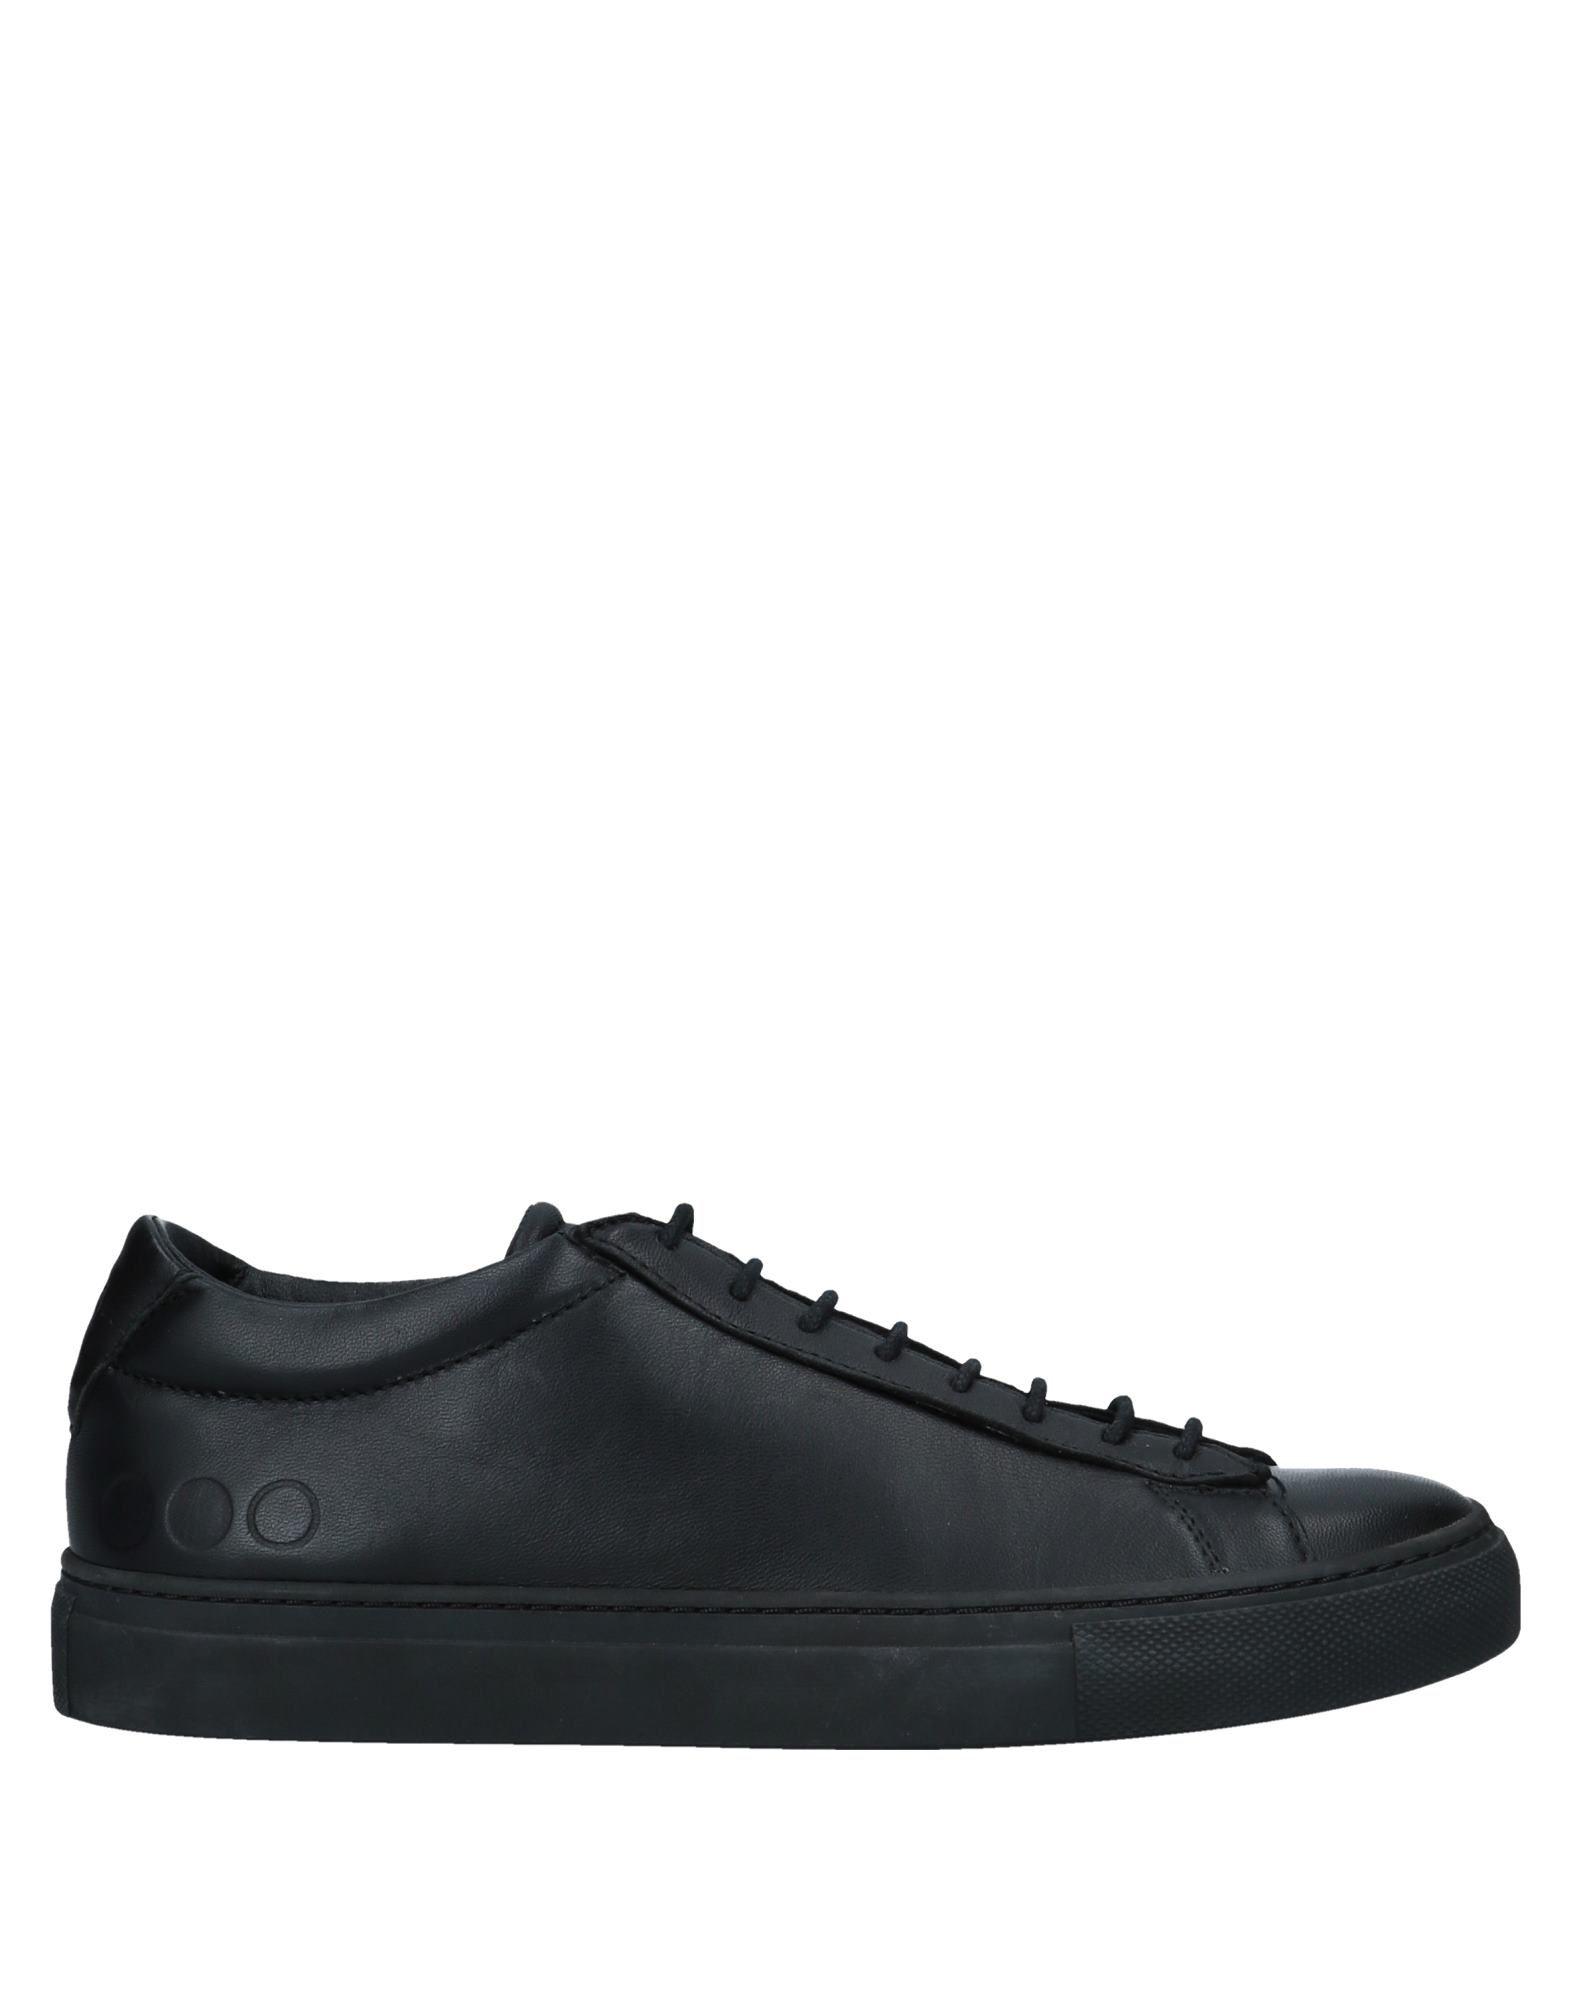 Primaforma Sneakers - Women Primaforma Sneakers - online on  Canada - Sneakers 11548649JJ ebd9e4